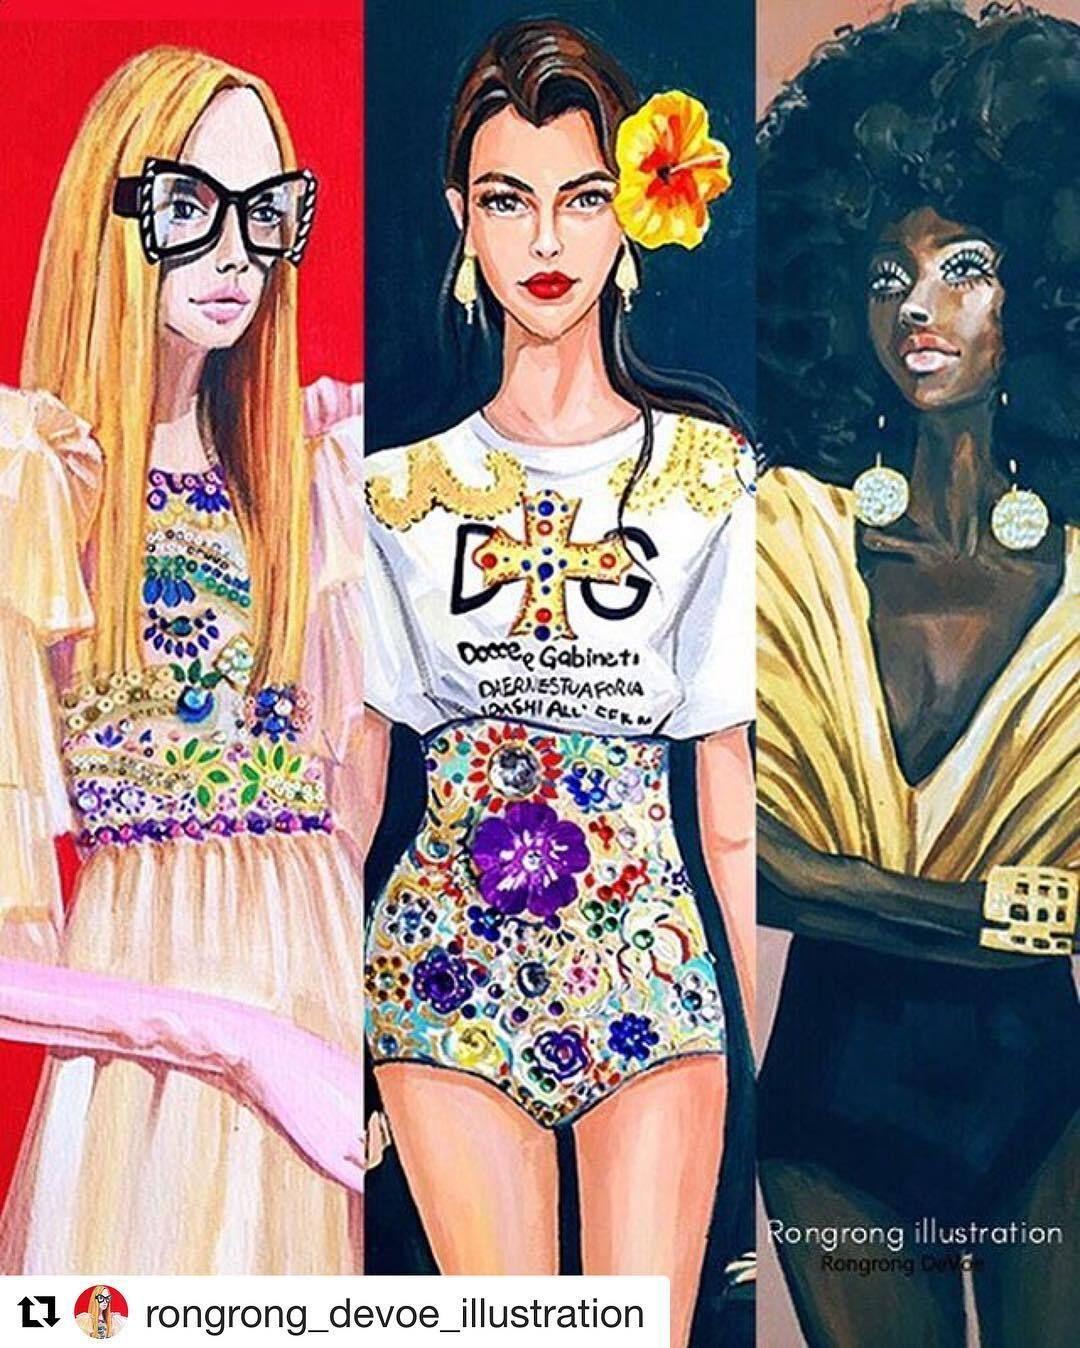 Style, Design & Class Repost rongrong_devoe